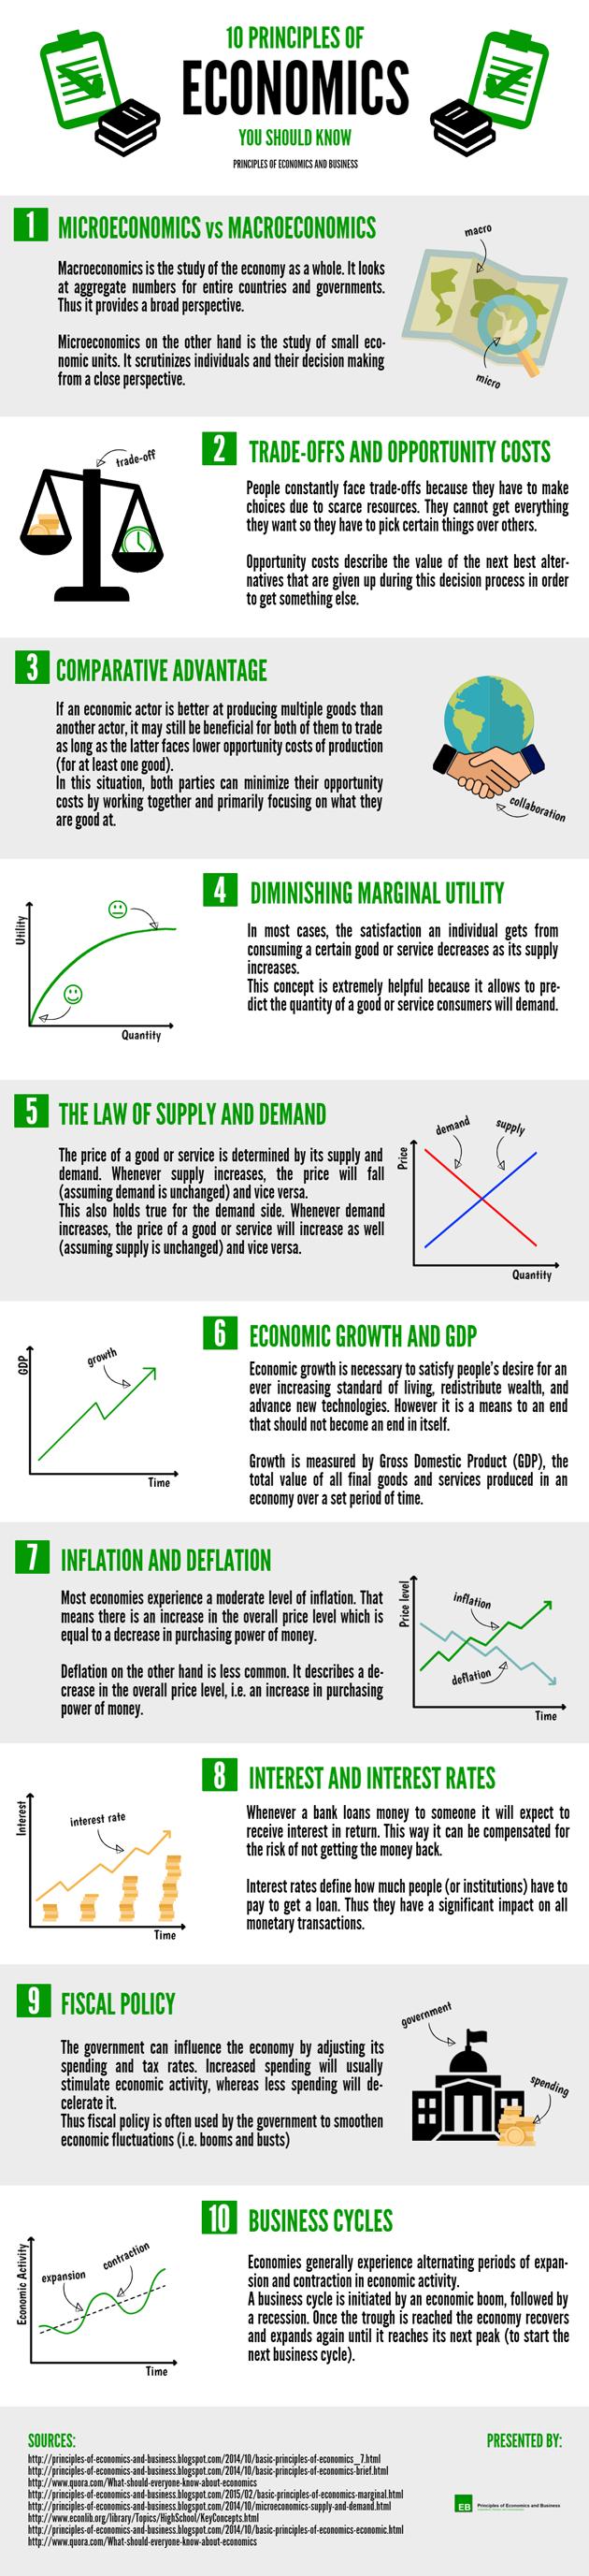 Infographic - 10 Principles of Economics You Should Know